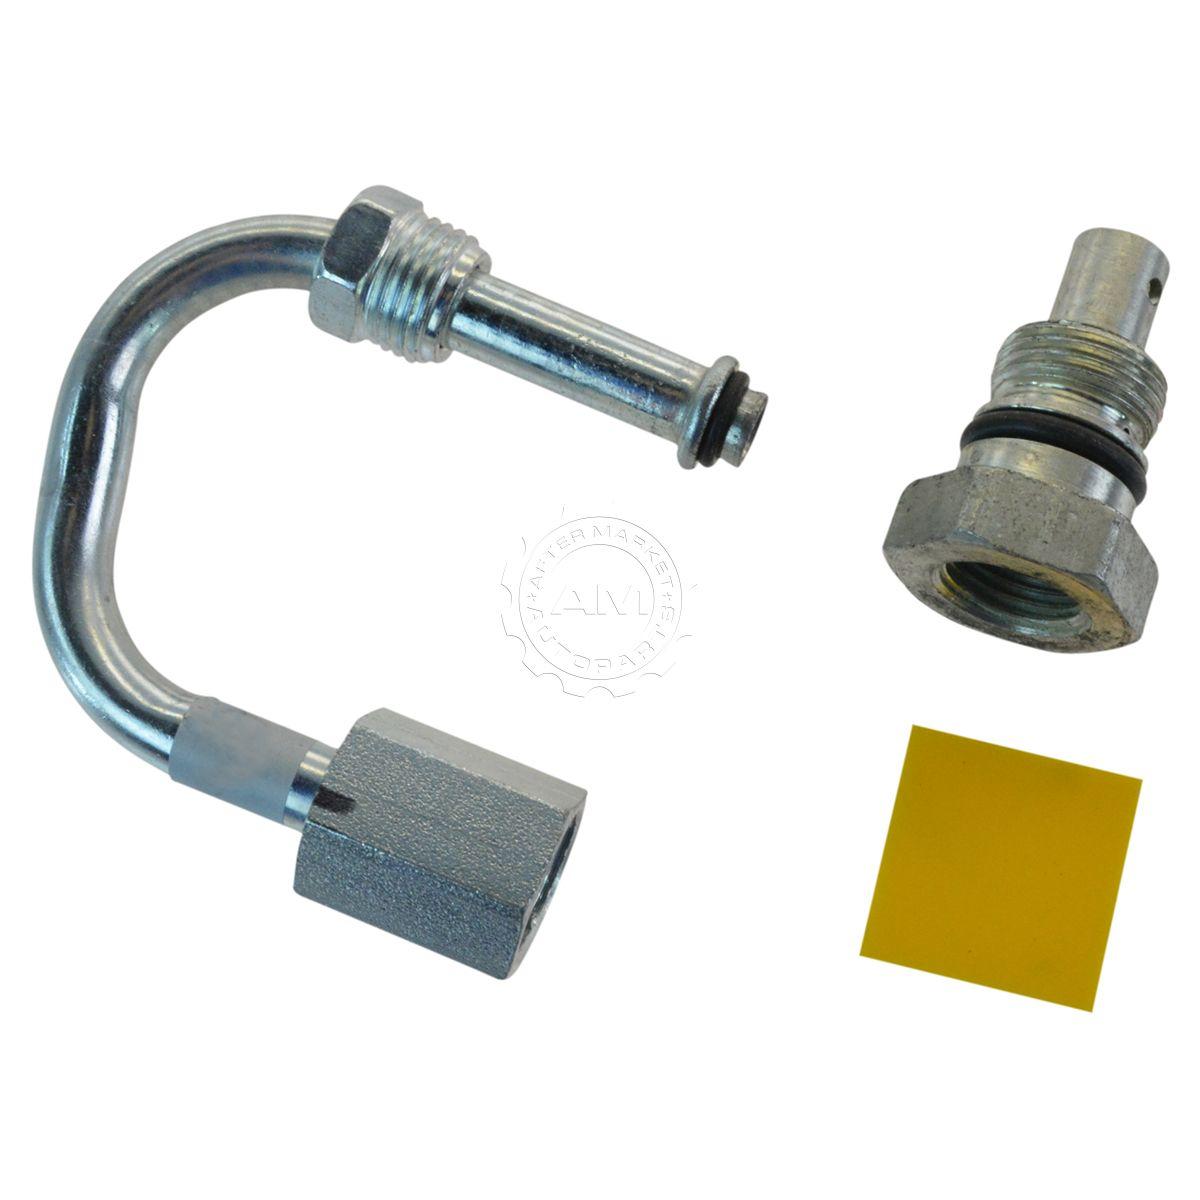 Oem power steering flow control valve for chevy gmc pickup for Motorized flow control valve